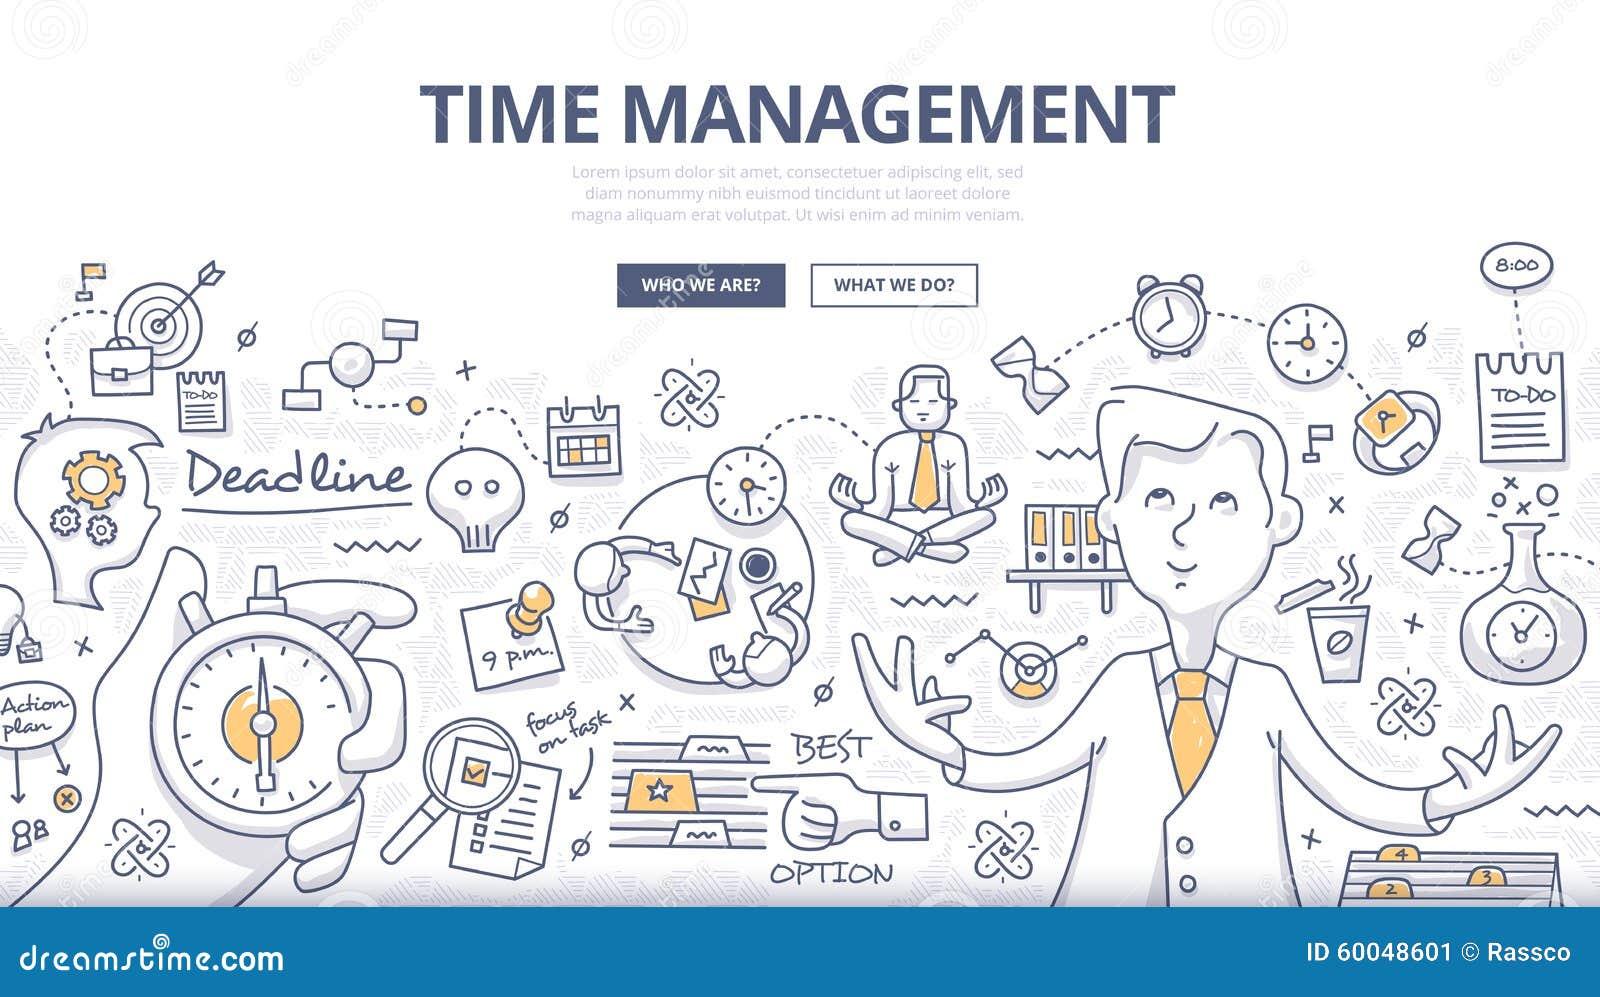 Time Management Doodle Concept Stock Vector - Image: 60048601